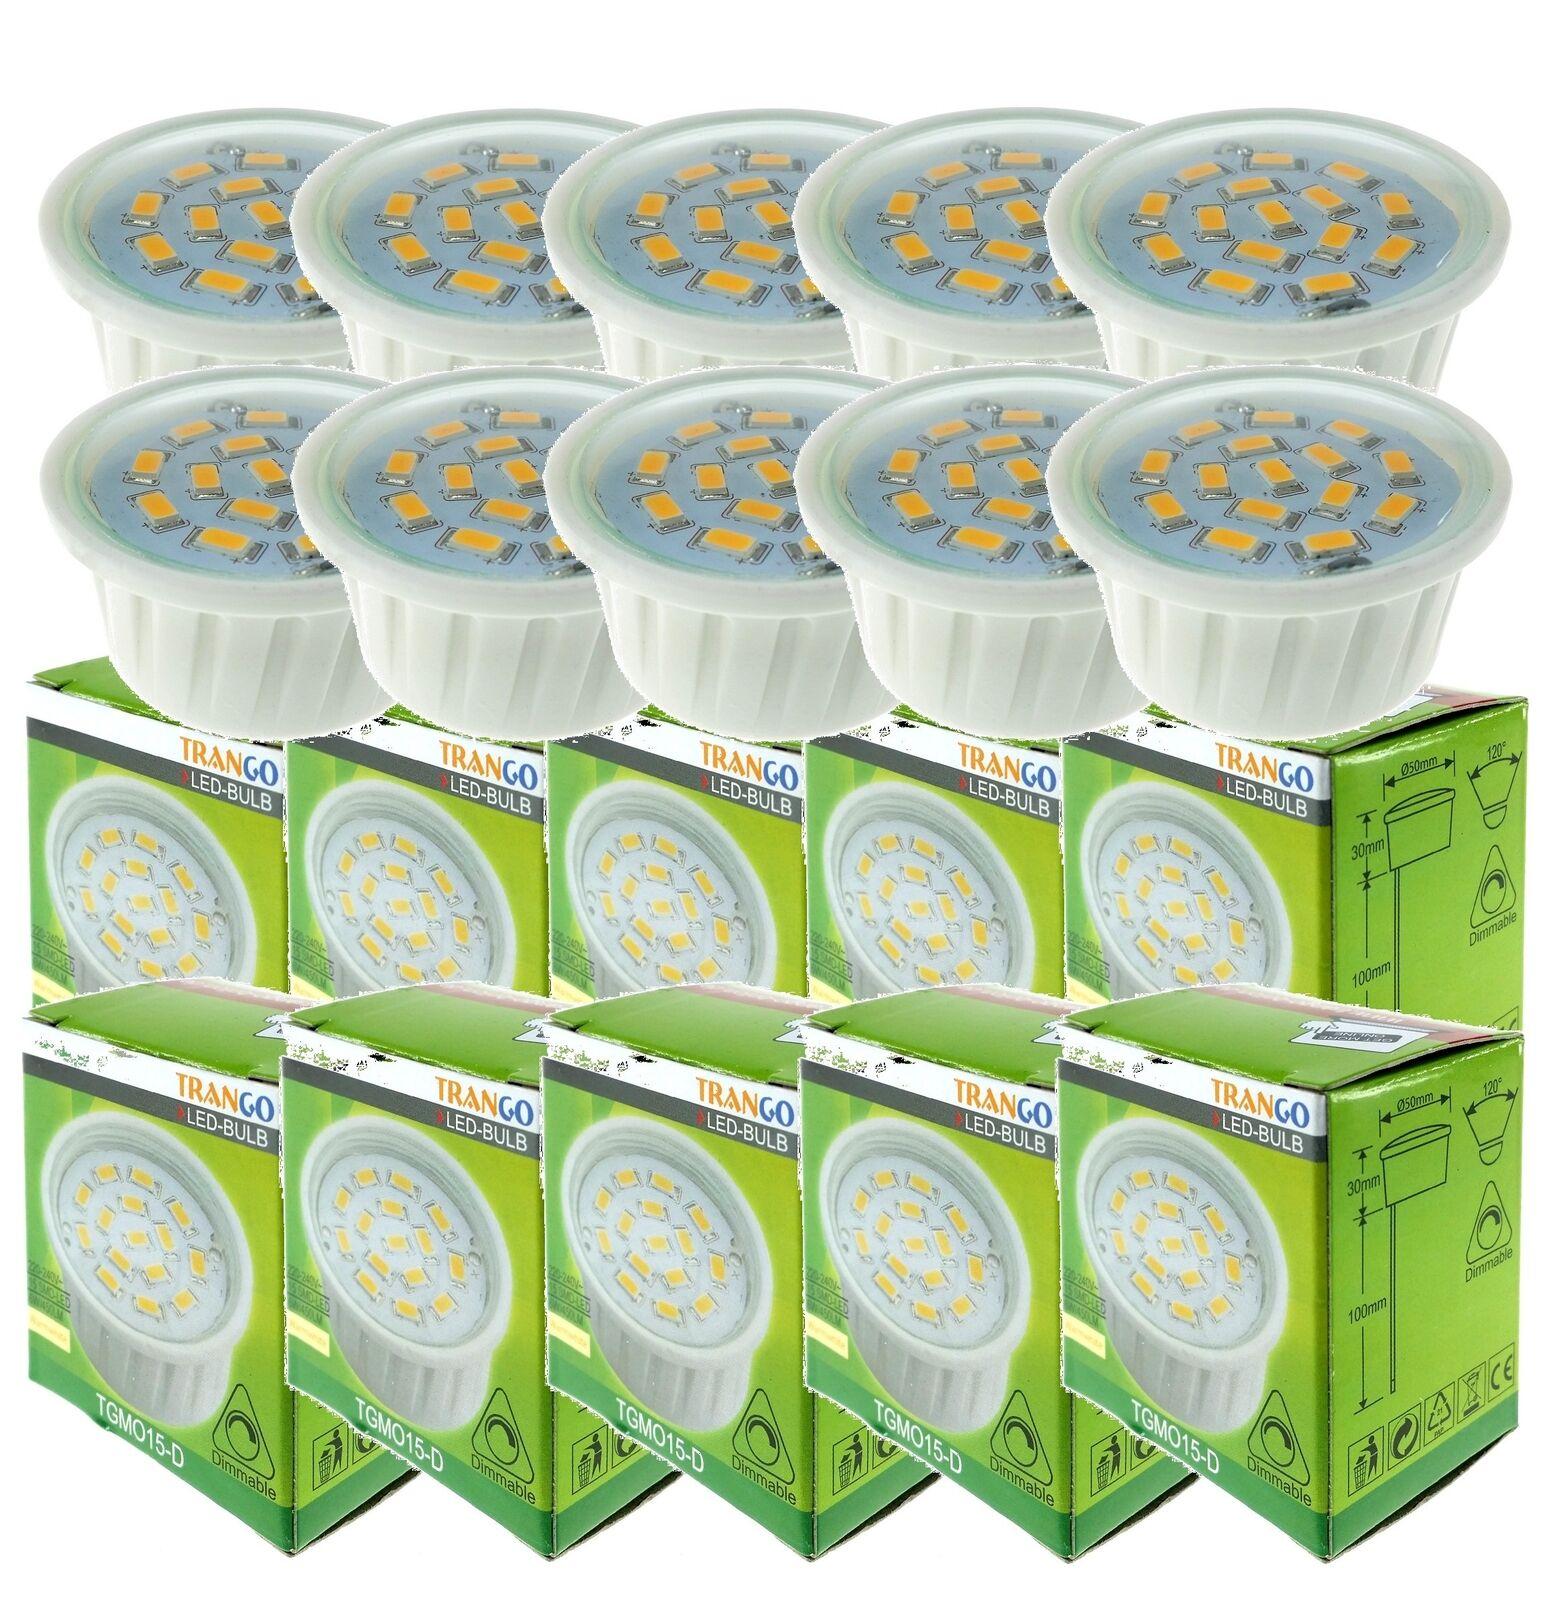 10 X trango módulo LED Regulable 6 Vatios blancoo Cálido para lámparas tgmo 15-D